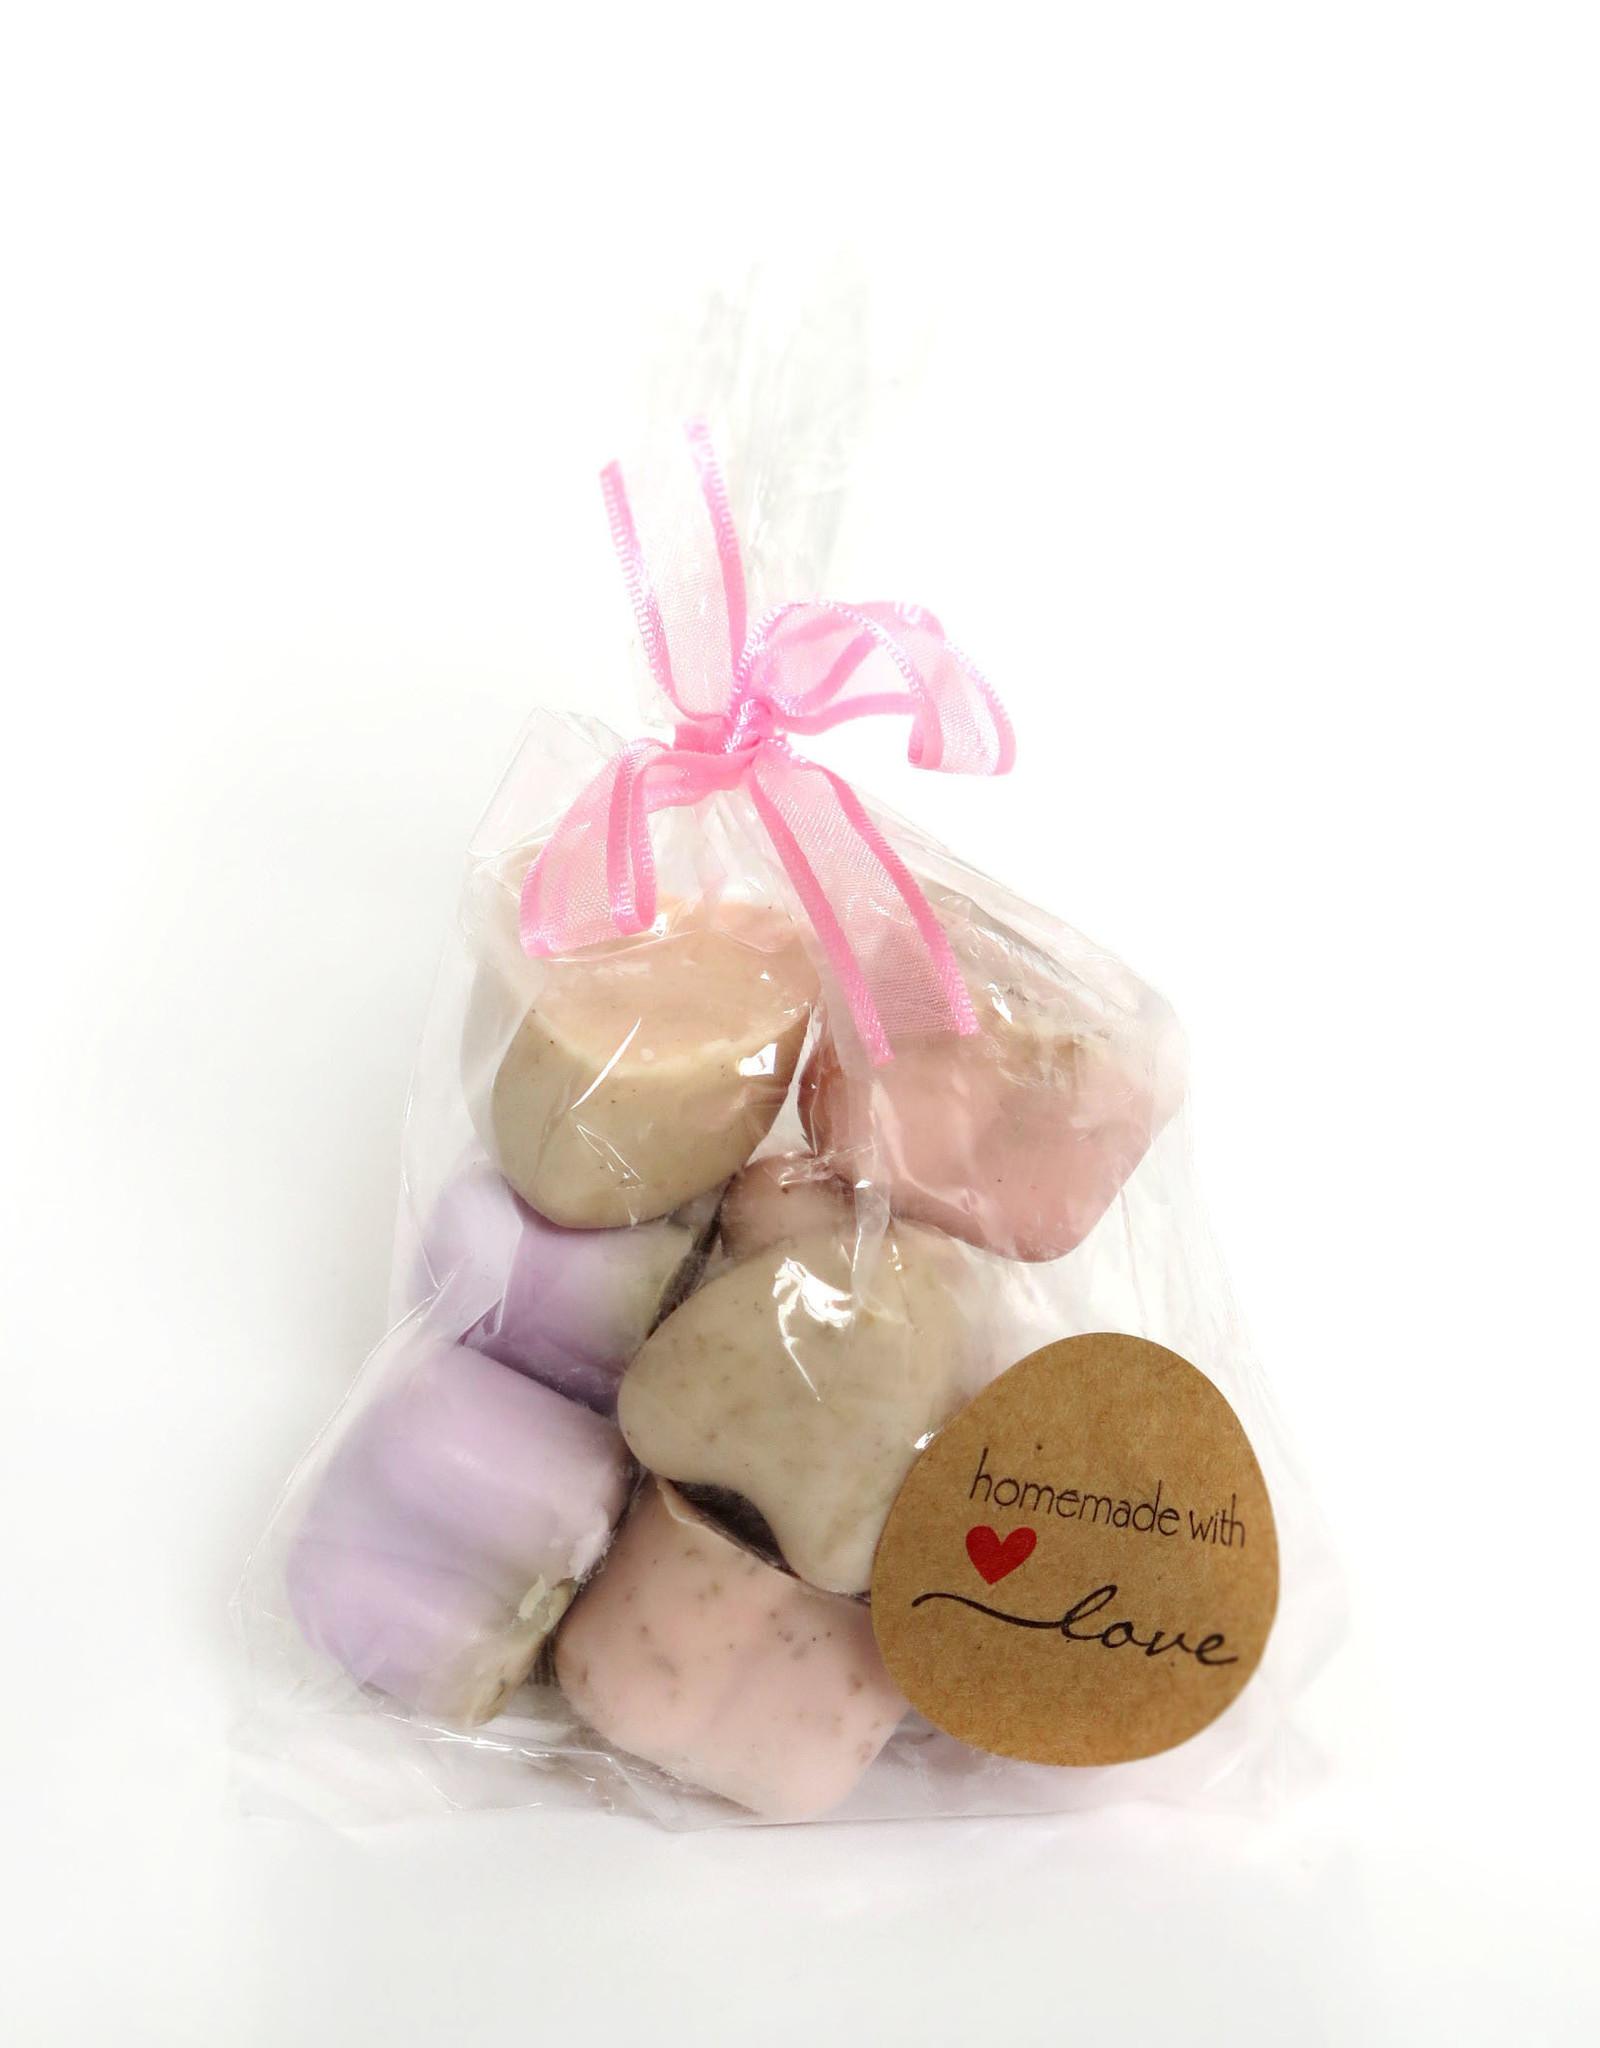 Adriana Vincenti Little Heart Soaps Mix Bag by Adriana Vincenti